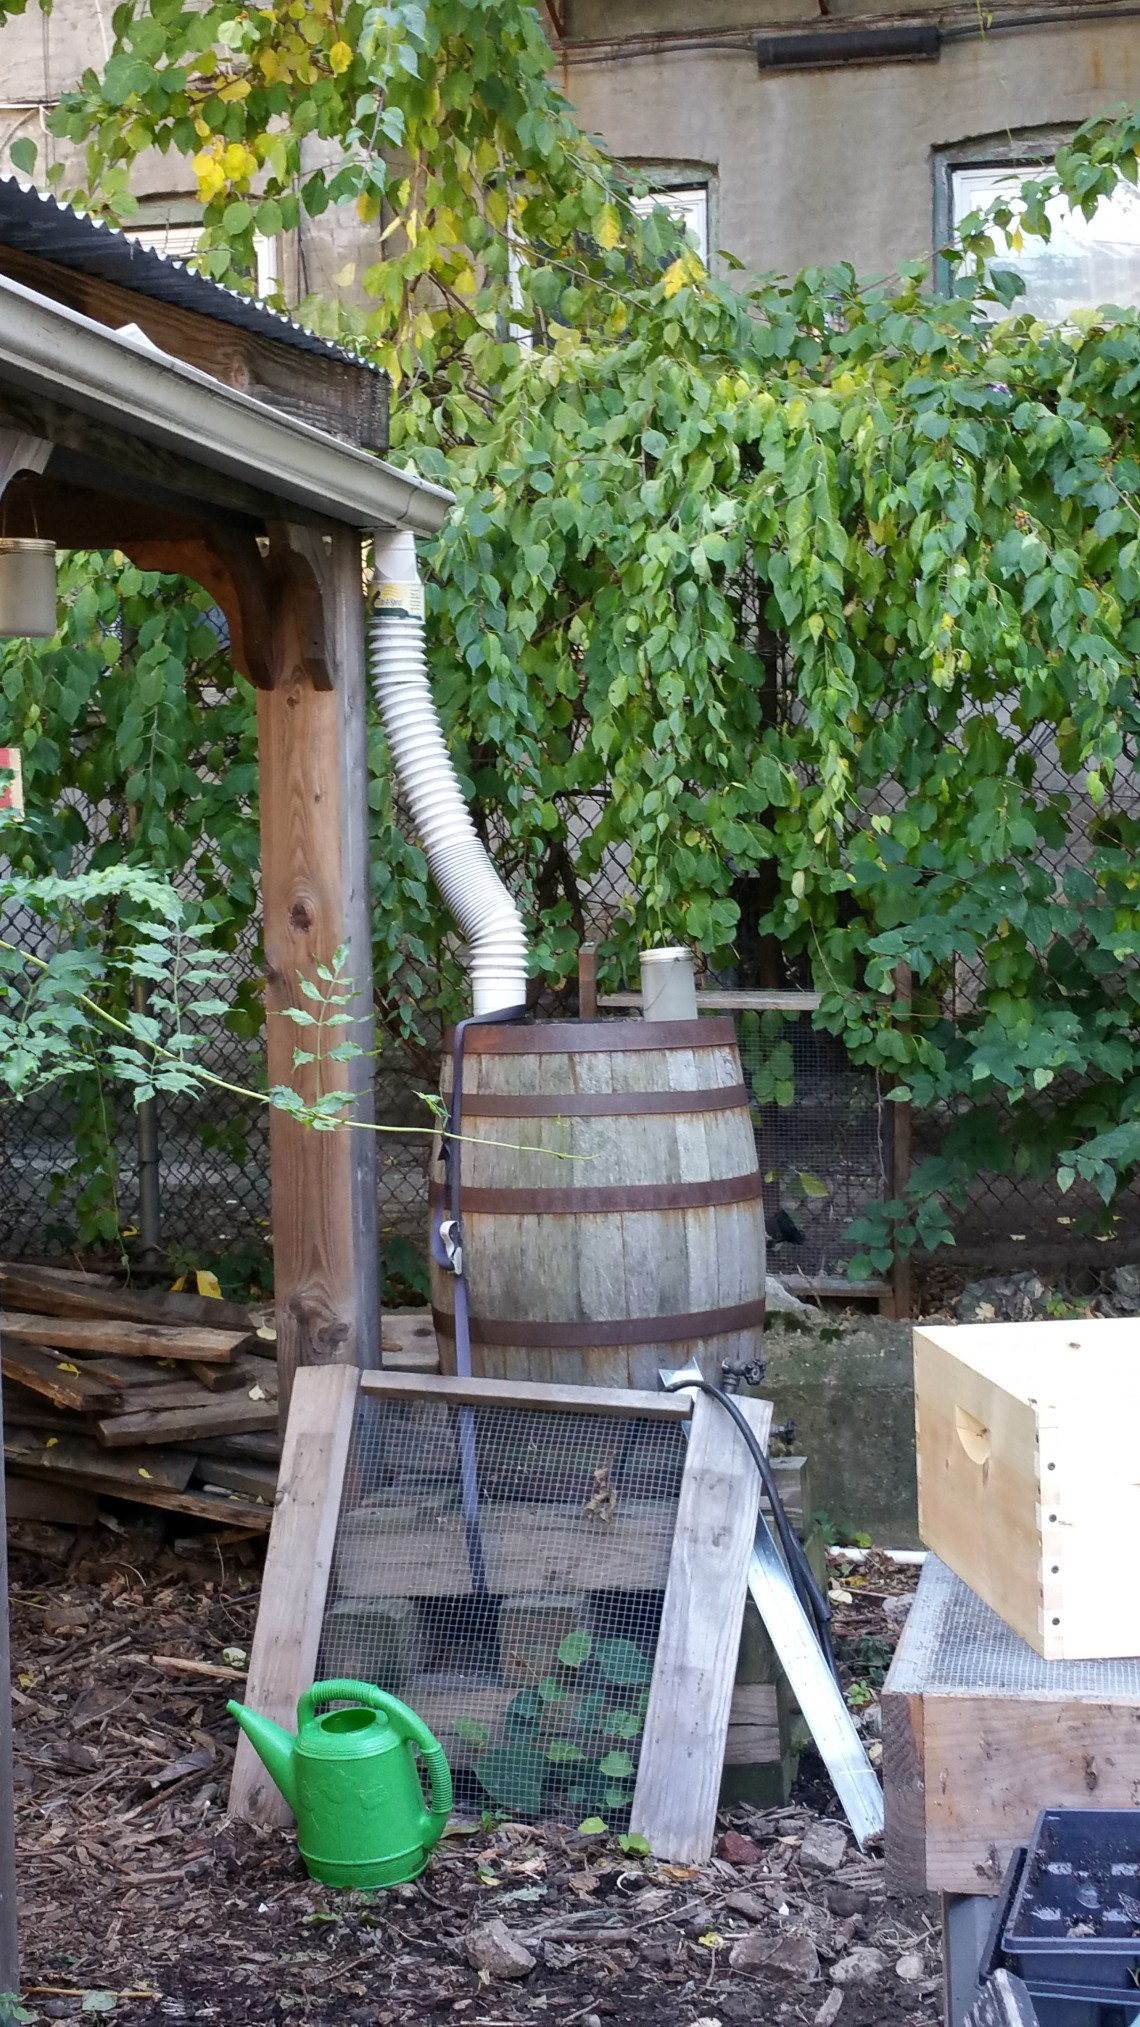 Rainwater harvesting system at 462 Halsey St Garden, Bklyn